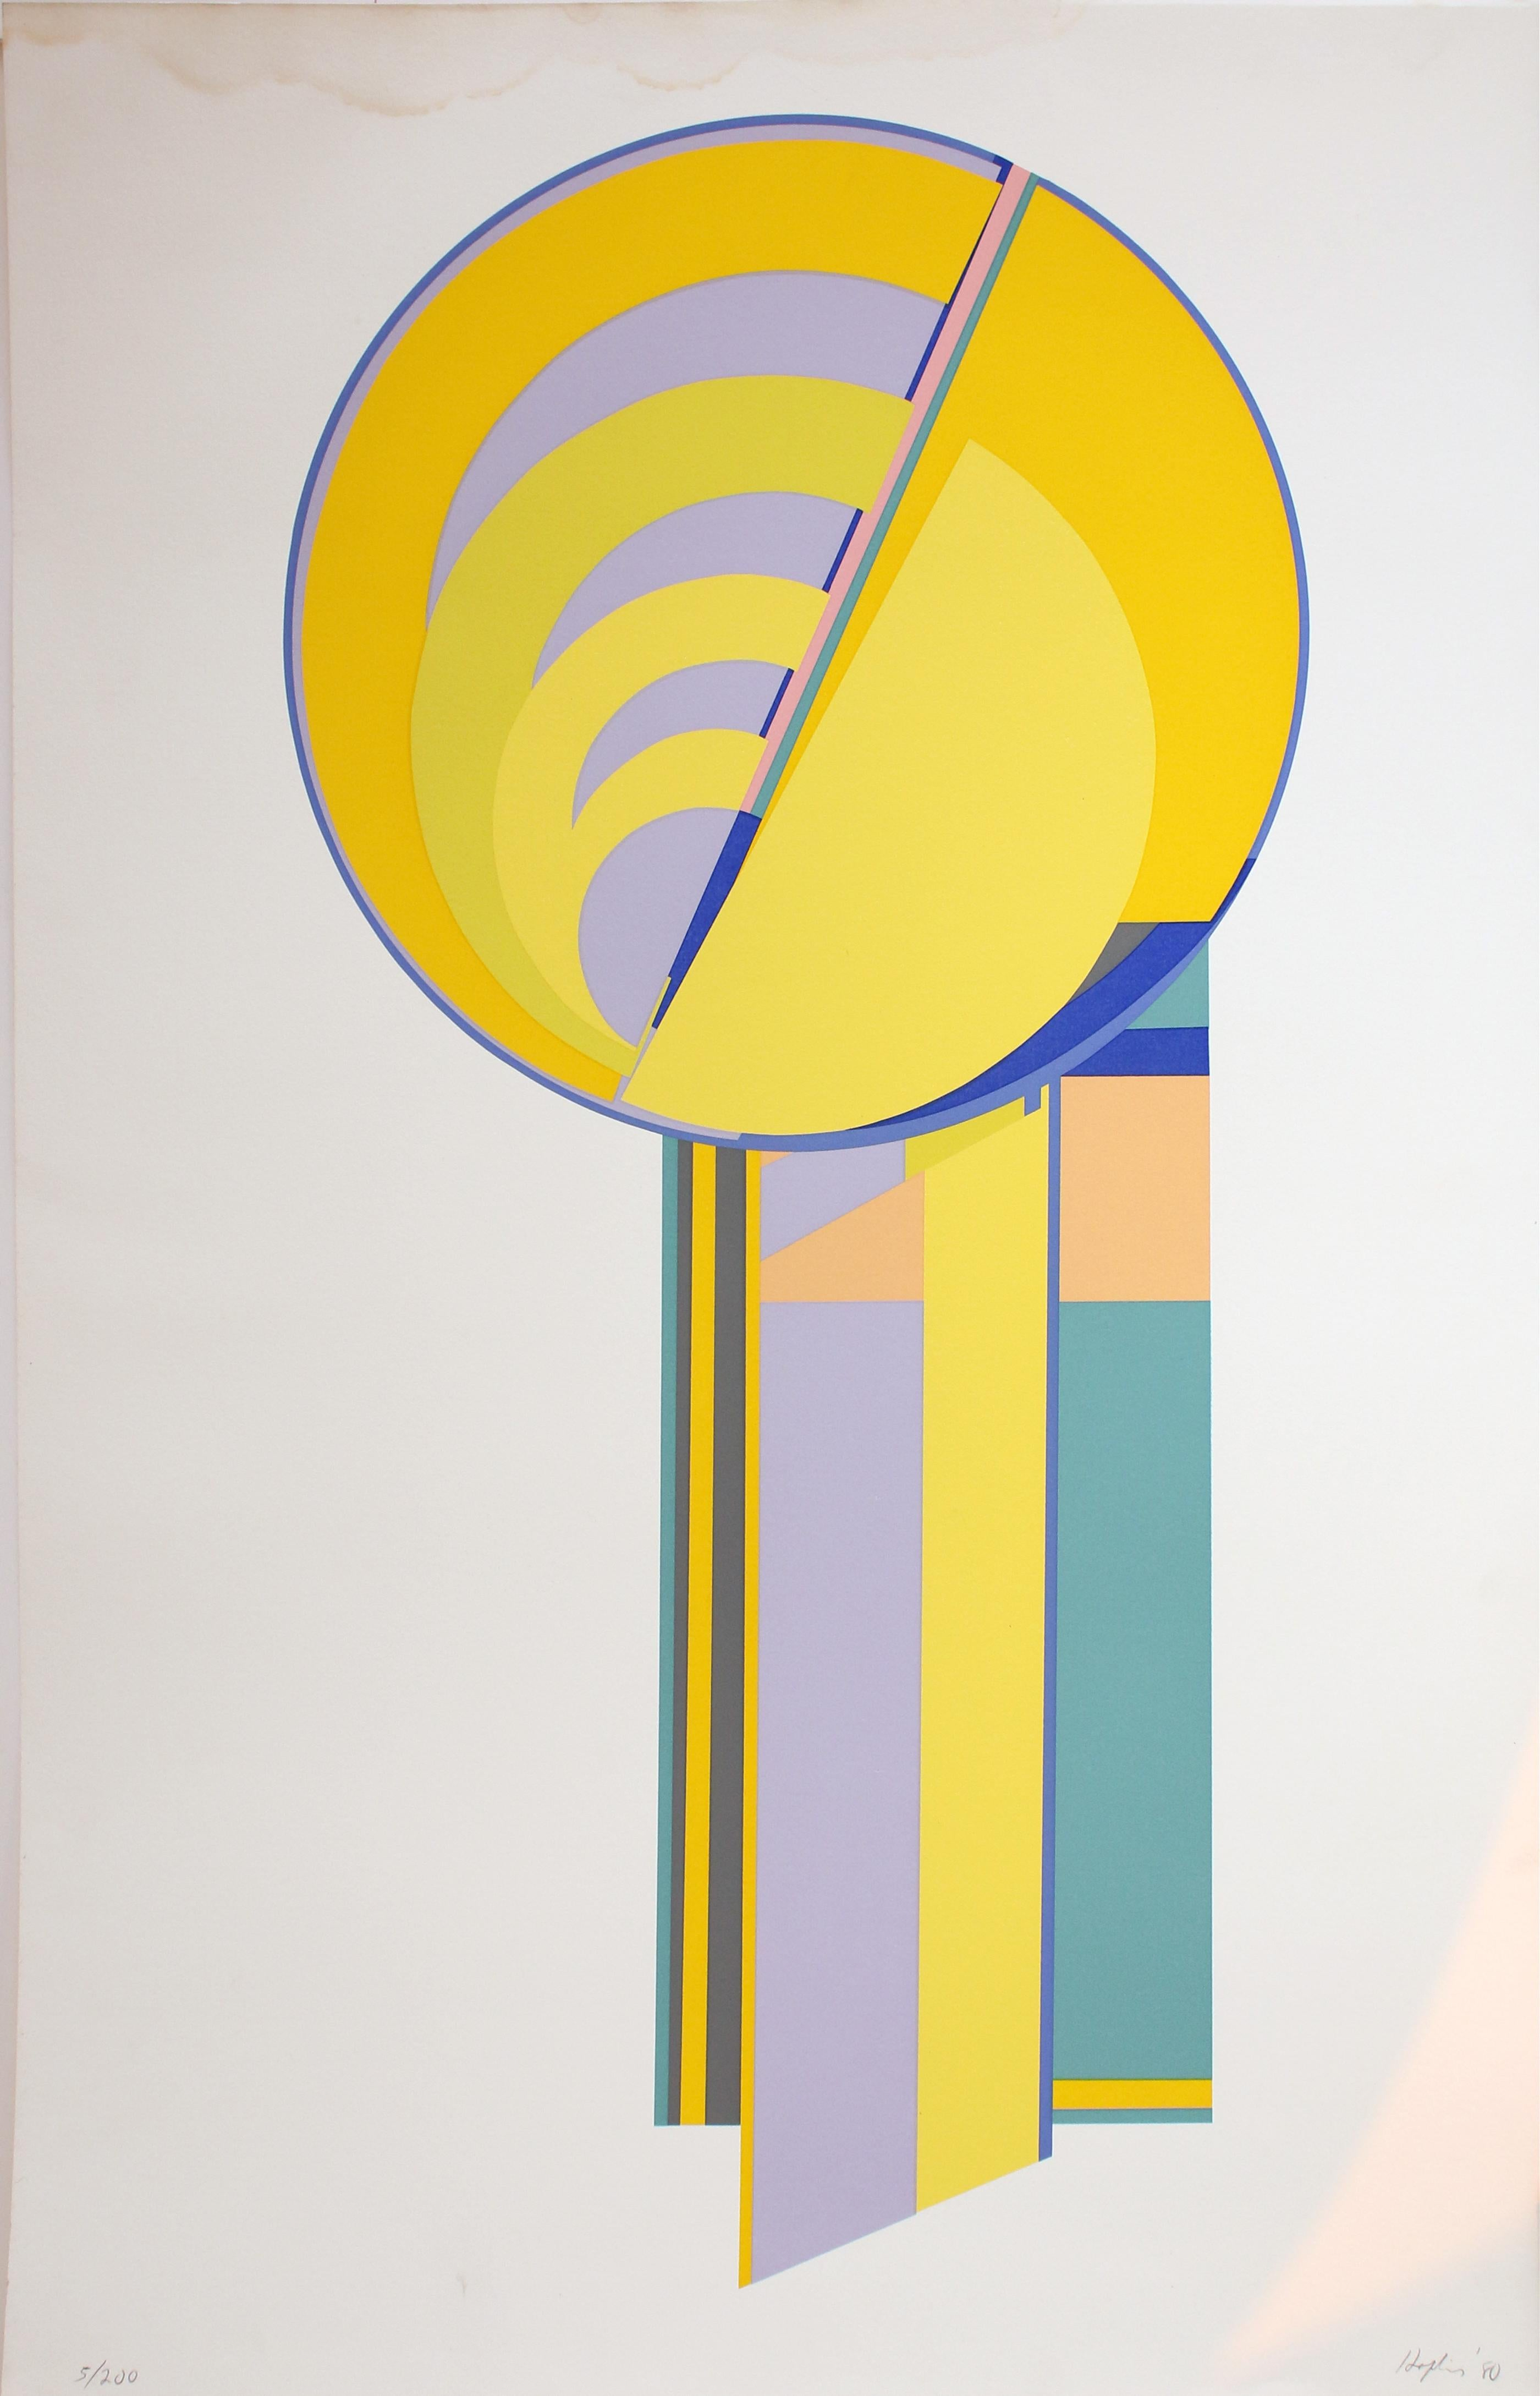 Untitled: Yellow Orange Abstract Geometric Serigraph (Edition 5/200)